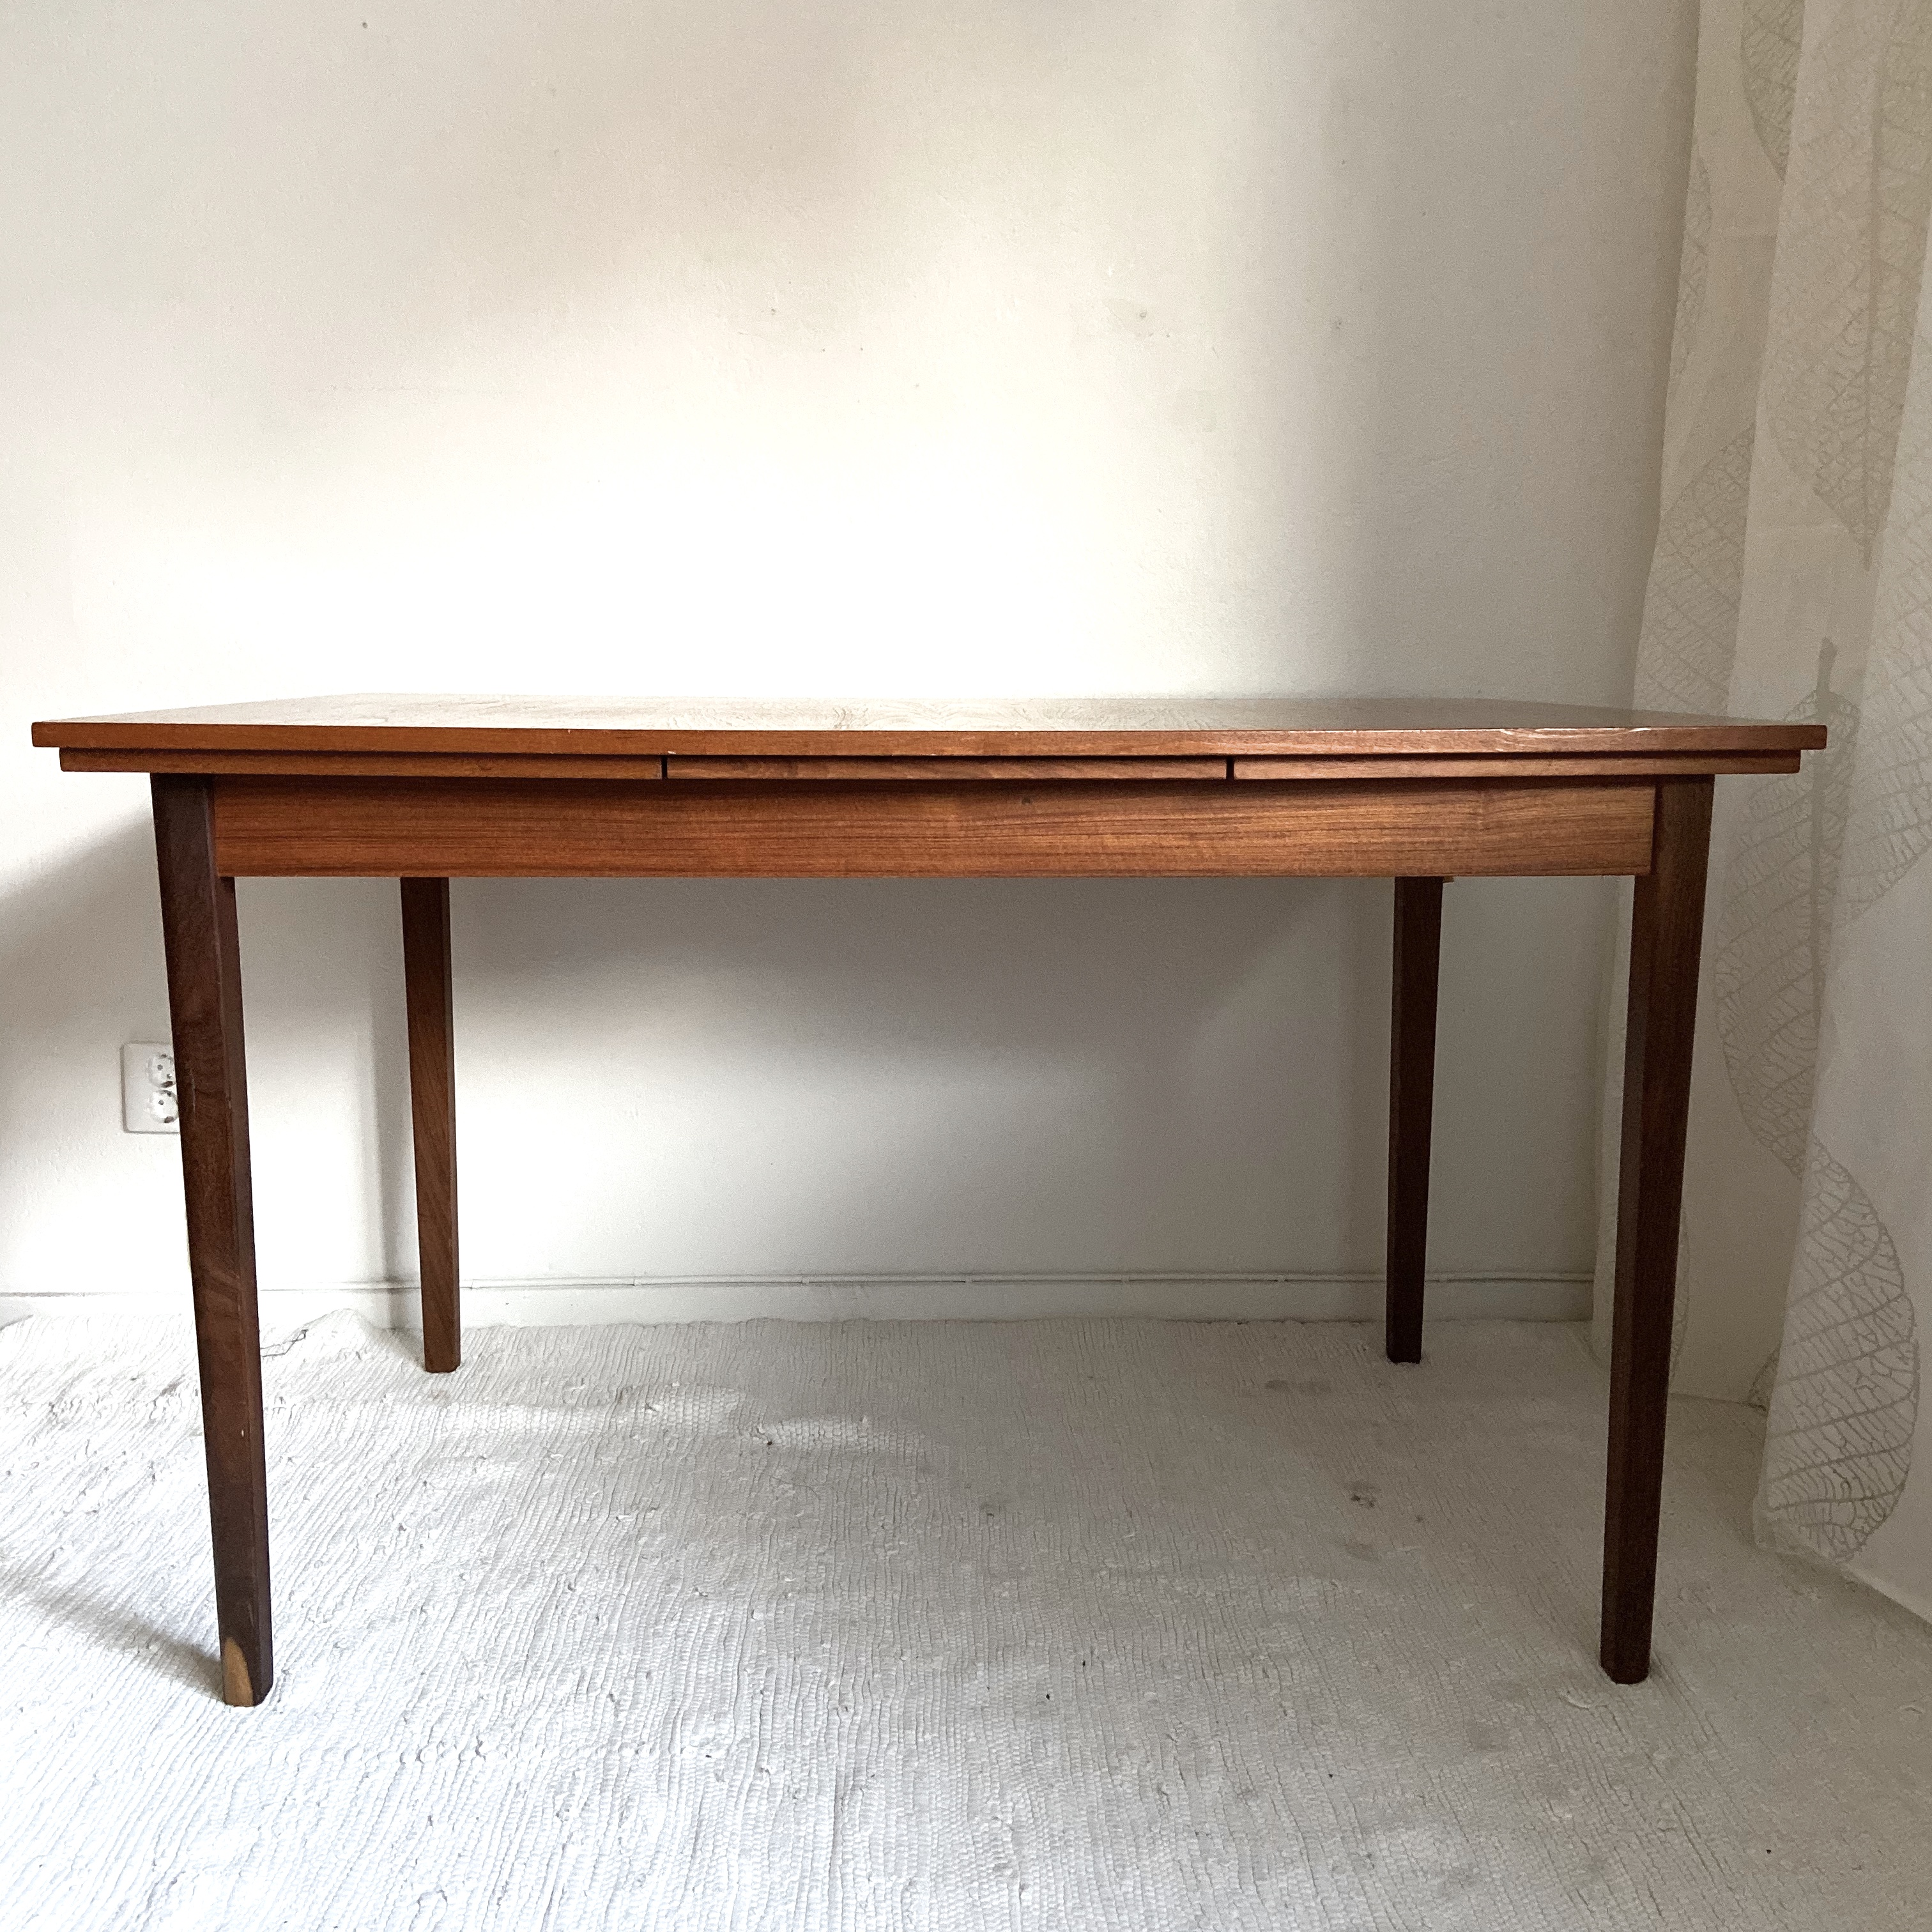 Matbord med två utdragsskivor, teak